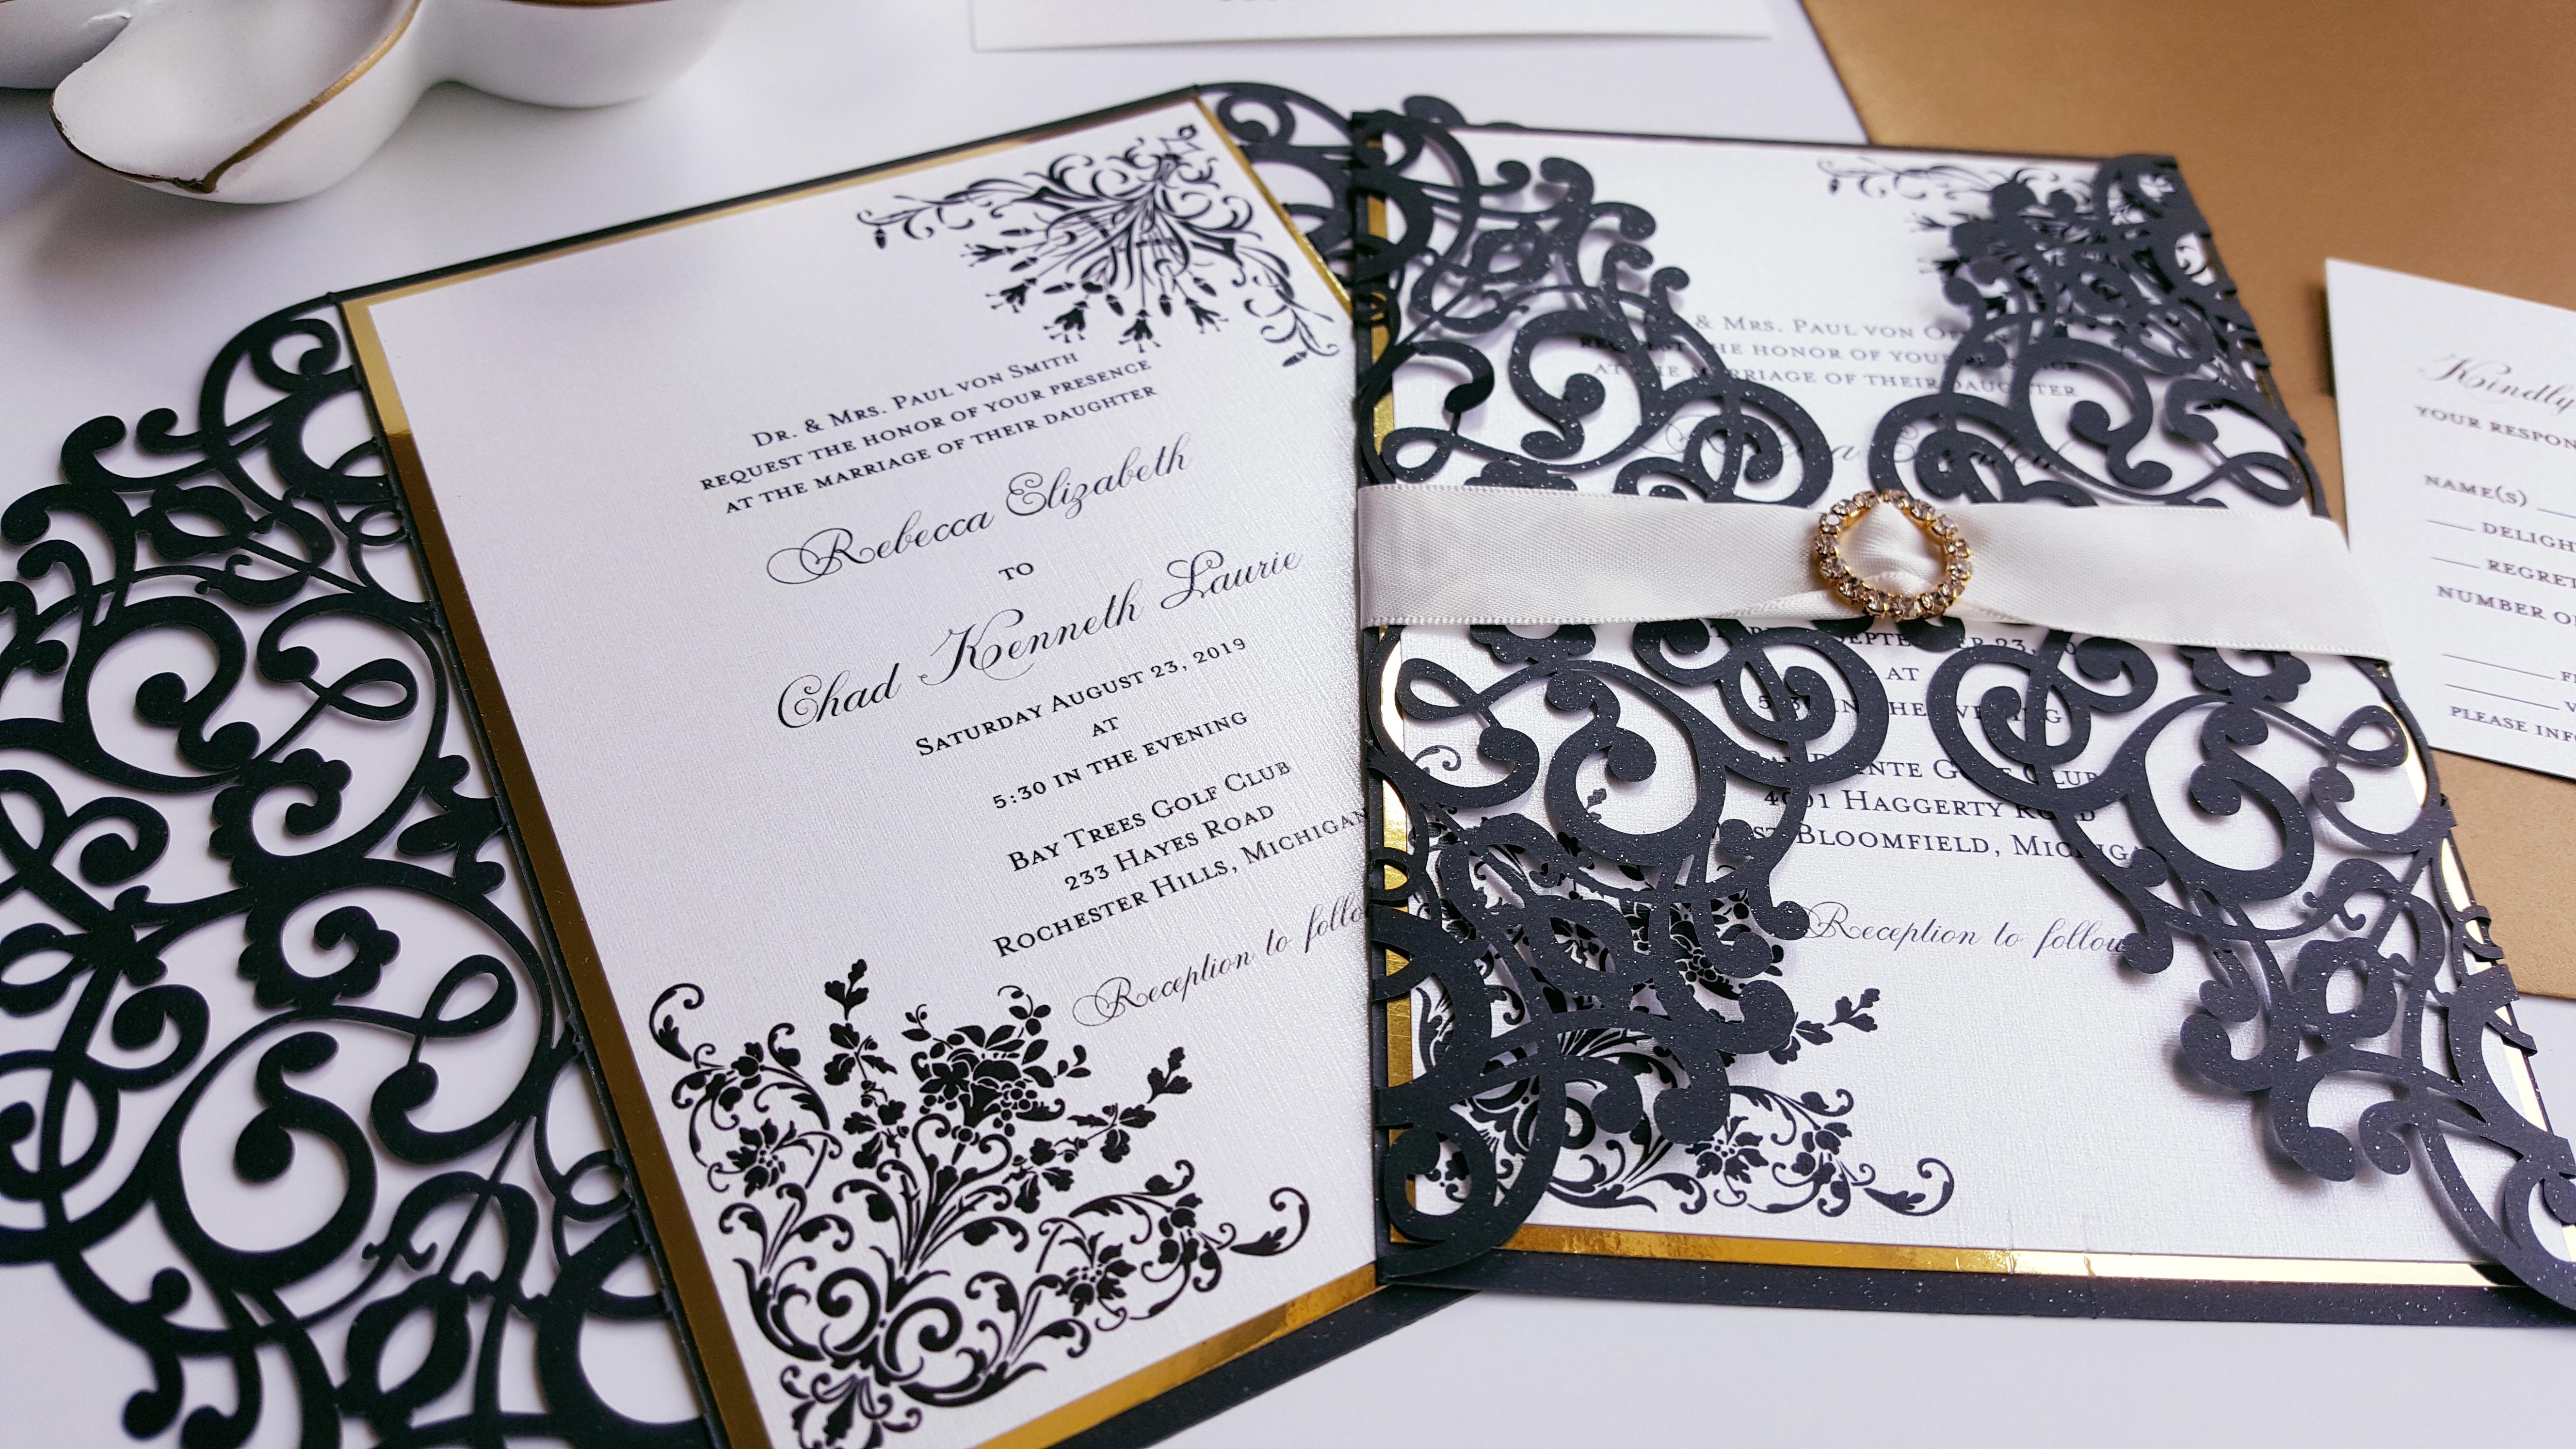 Elegant simple wedding invitations - Black and white